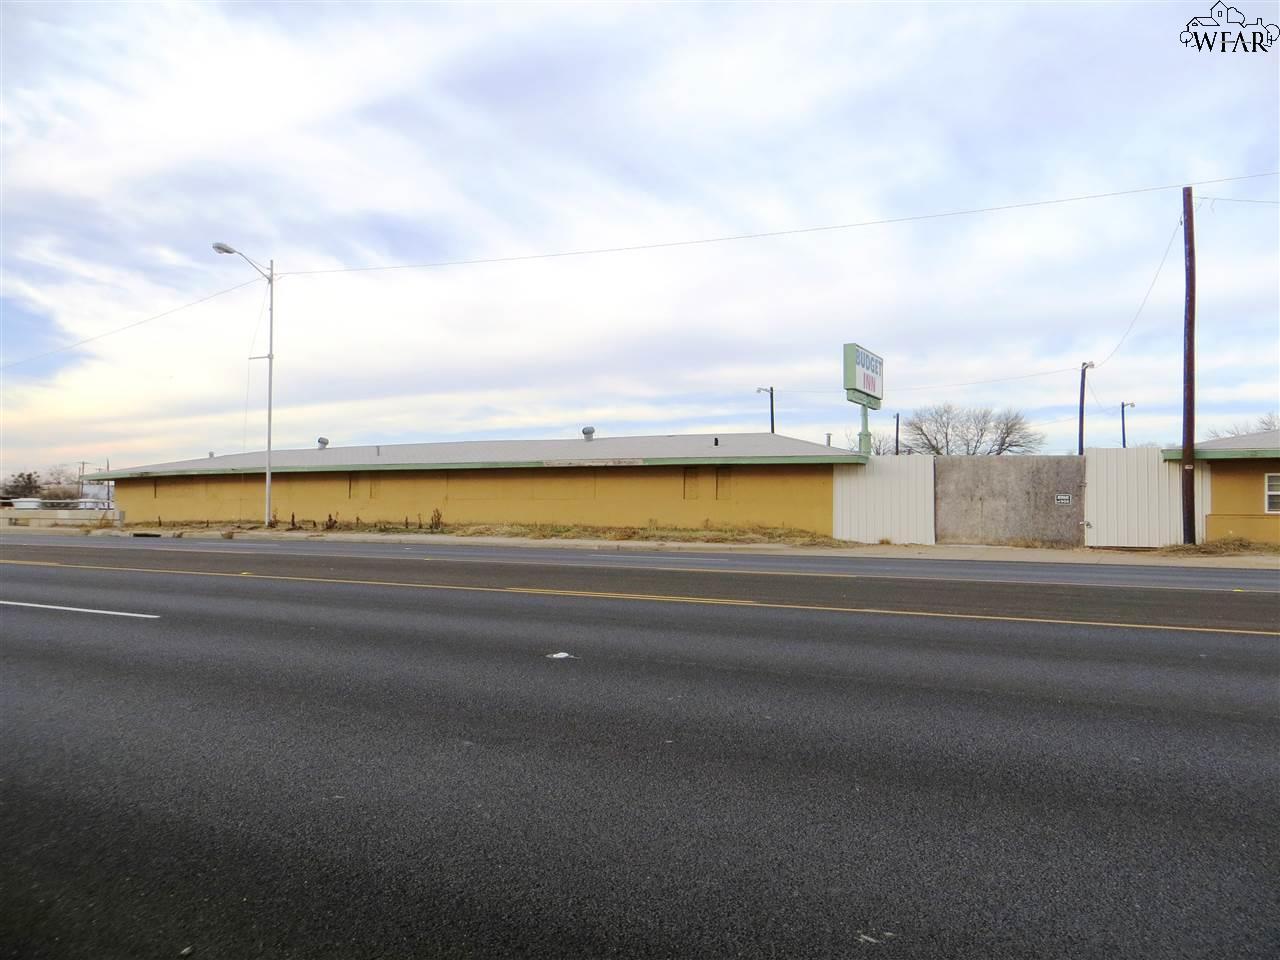 914 E SCOTT AVENUE, Wichita Falls, TX 76301